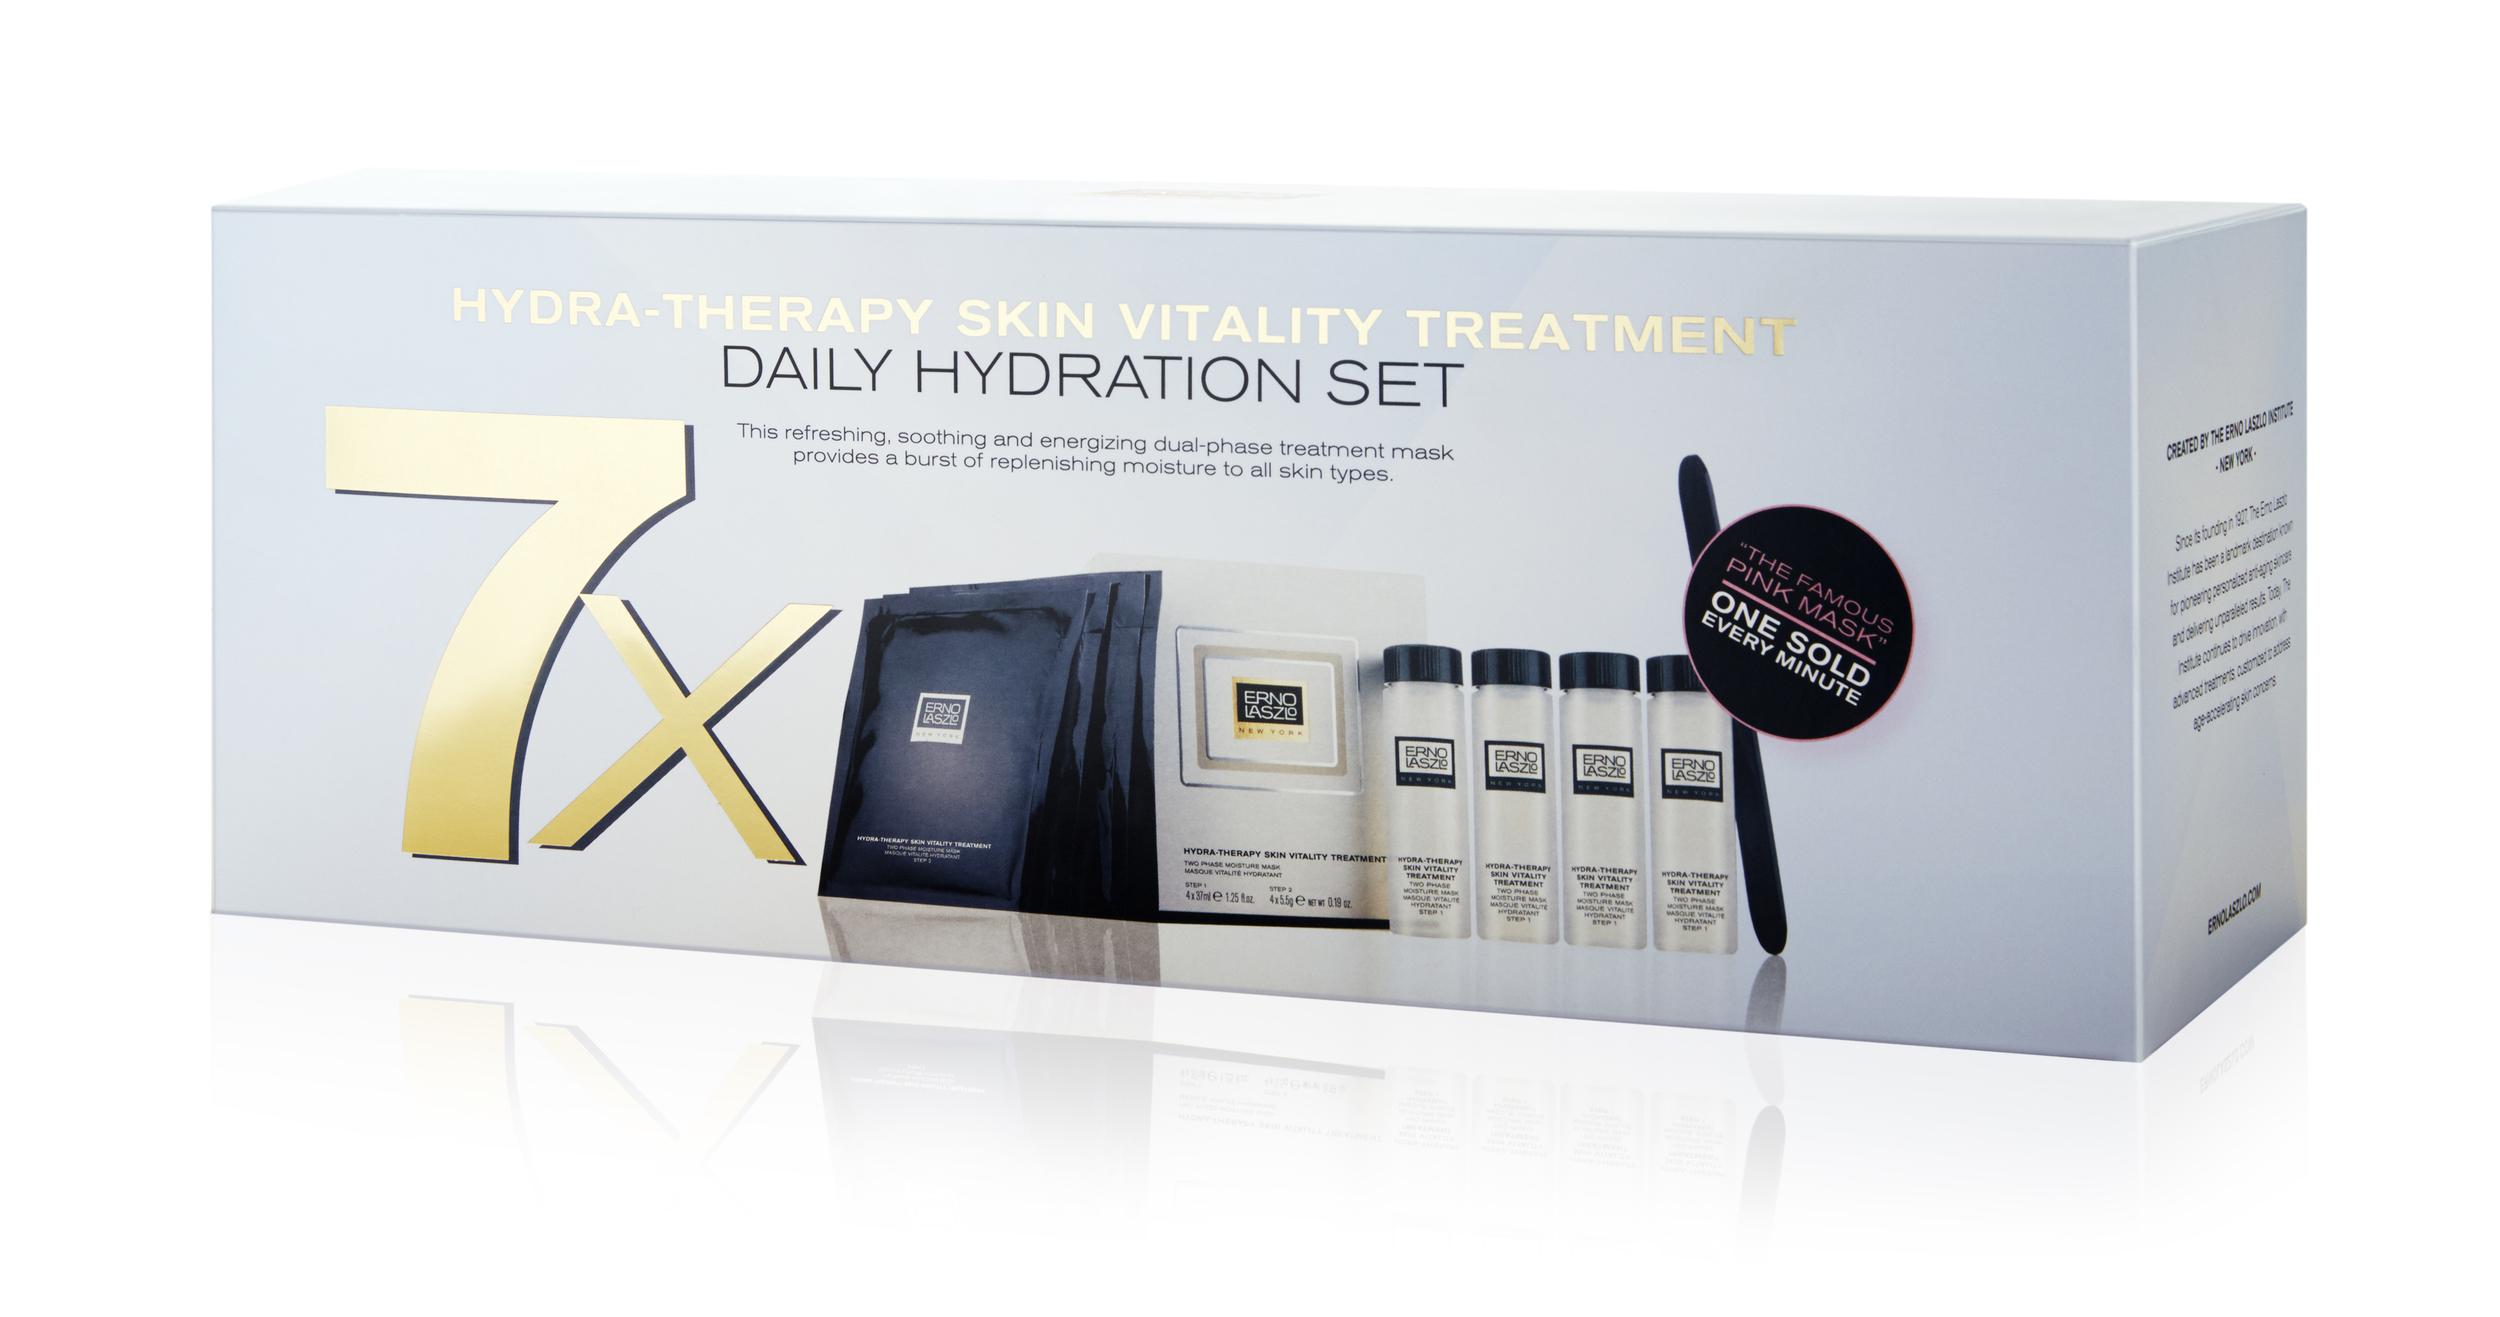 28 Day Hydration Set Back Catalog 8044004.jpg